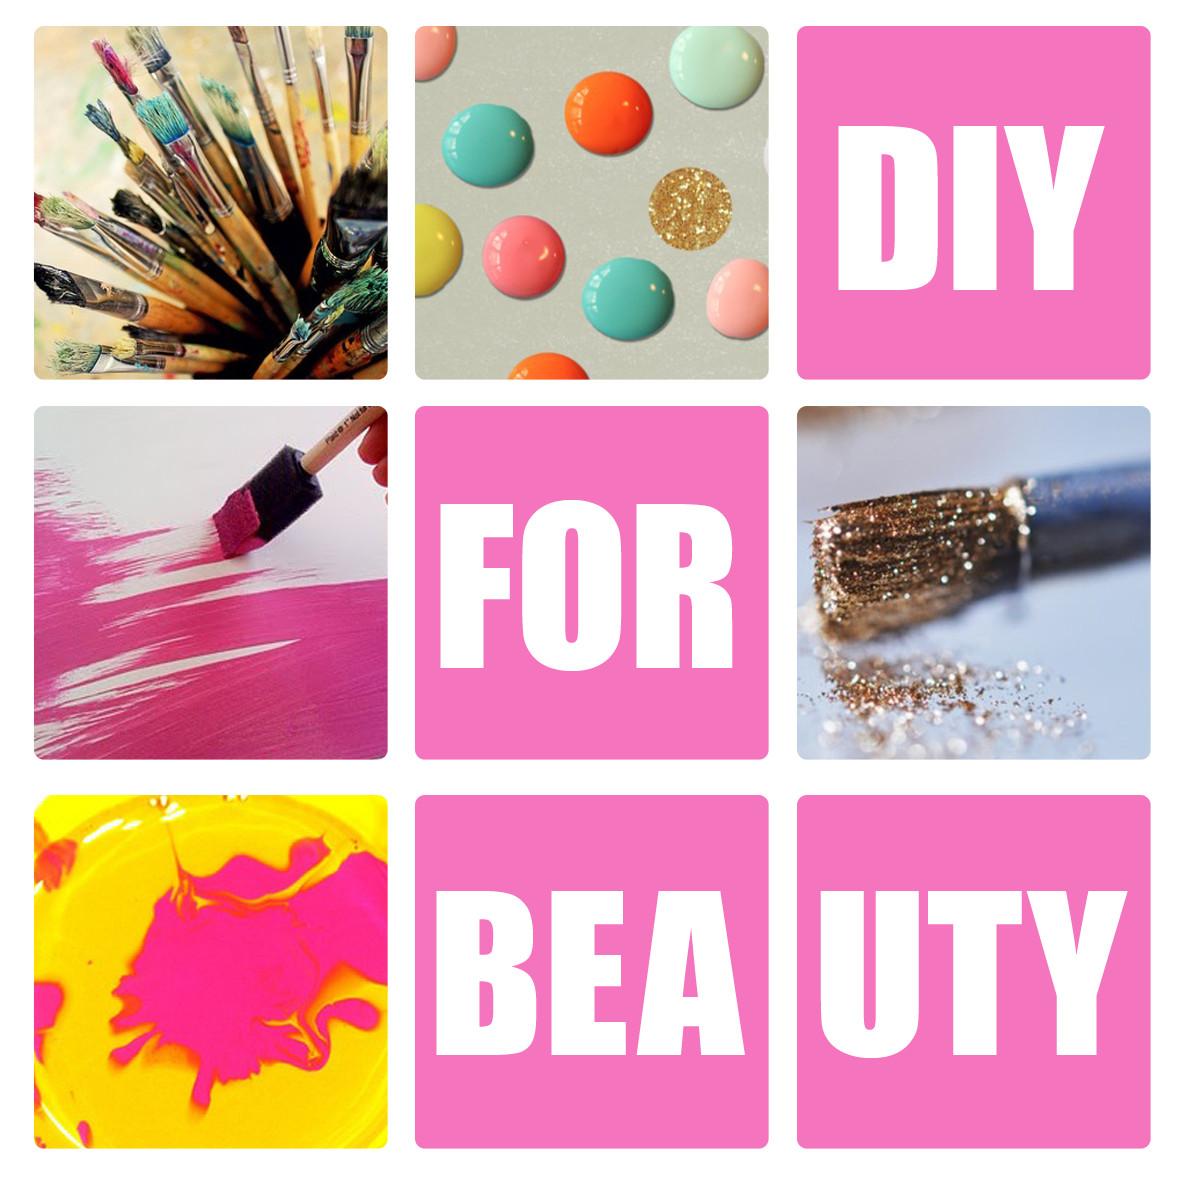 Diy Beauty  My Beauty DIY 2 Dark Spot Treatment – InTheLifeWithAyo